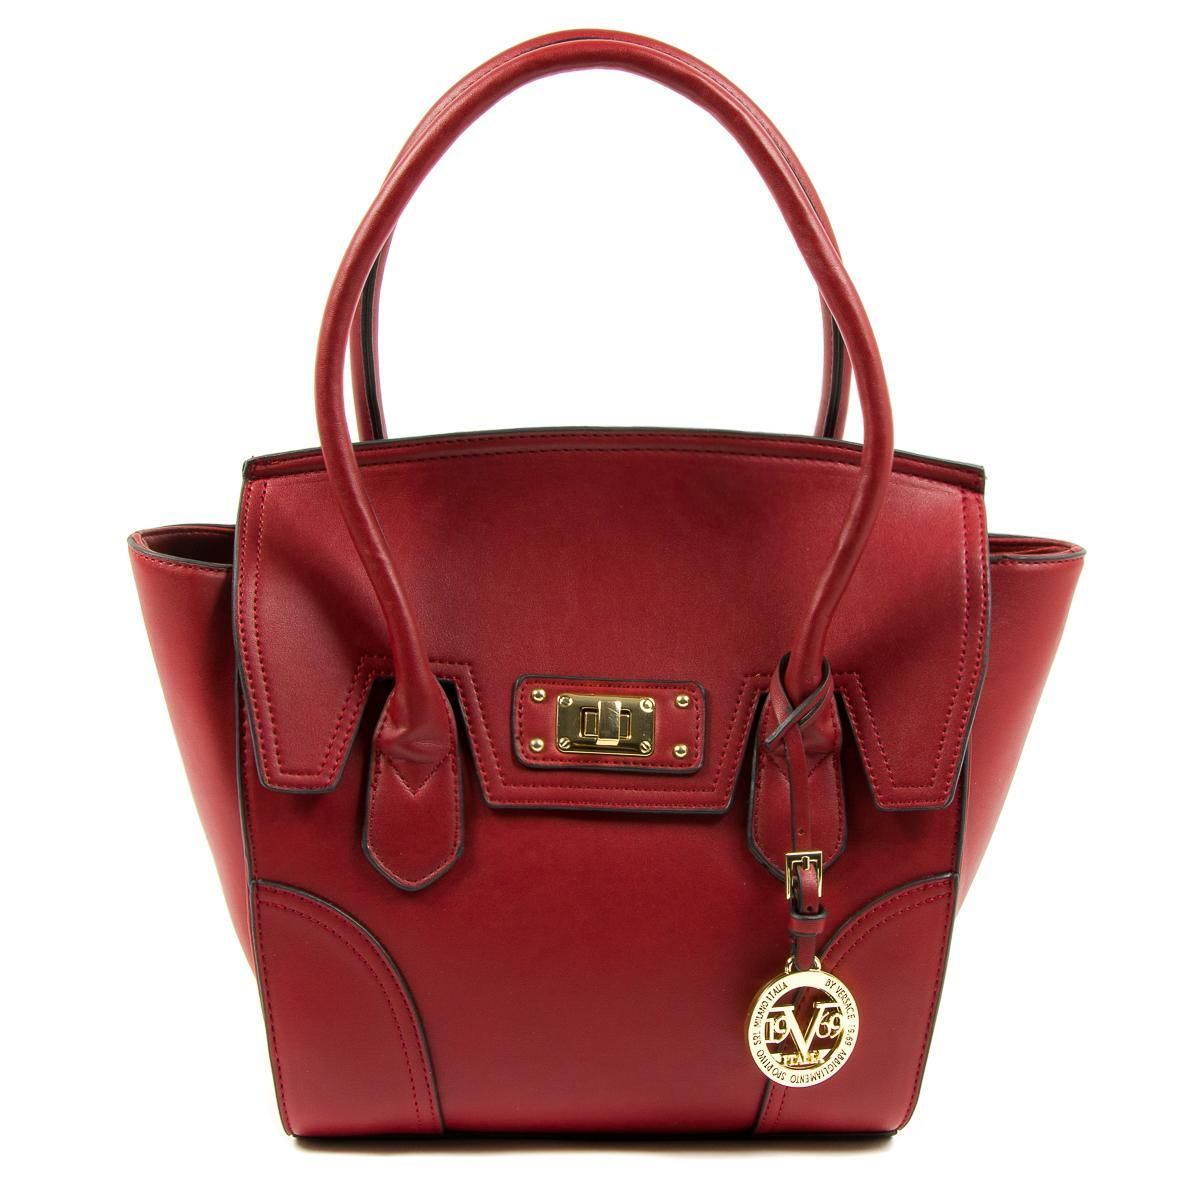 afc7dcede7 V 1969 Italia Womens Handbag Bordeaux SALLY in 2019 | Products ...